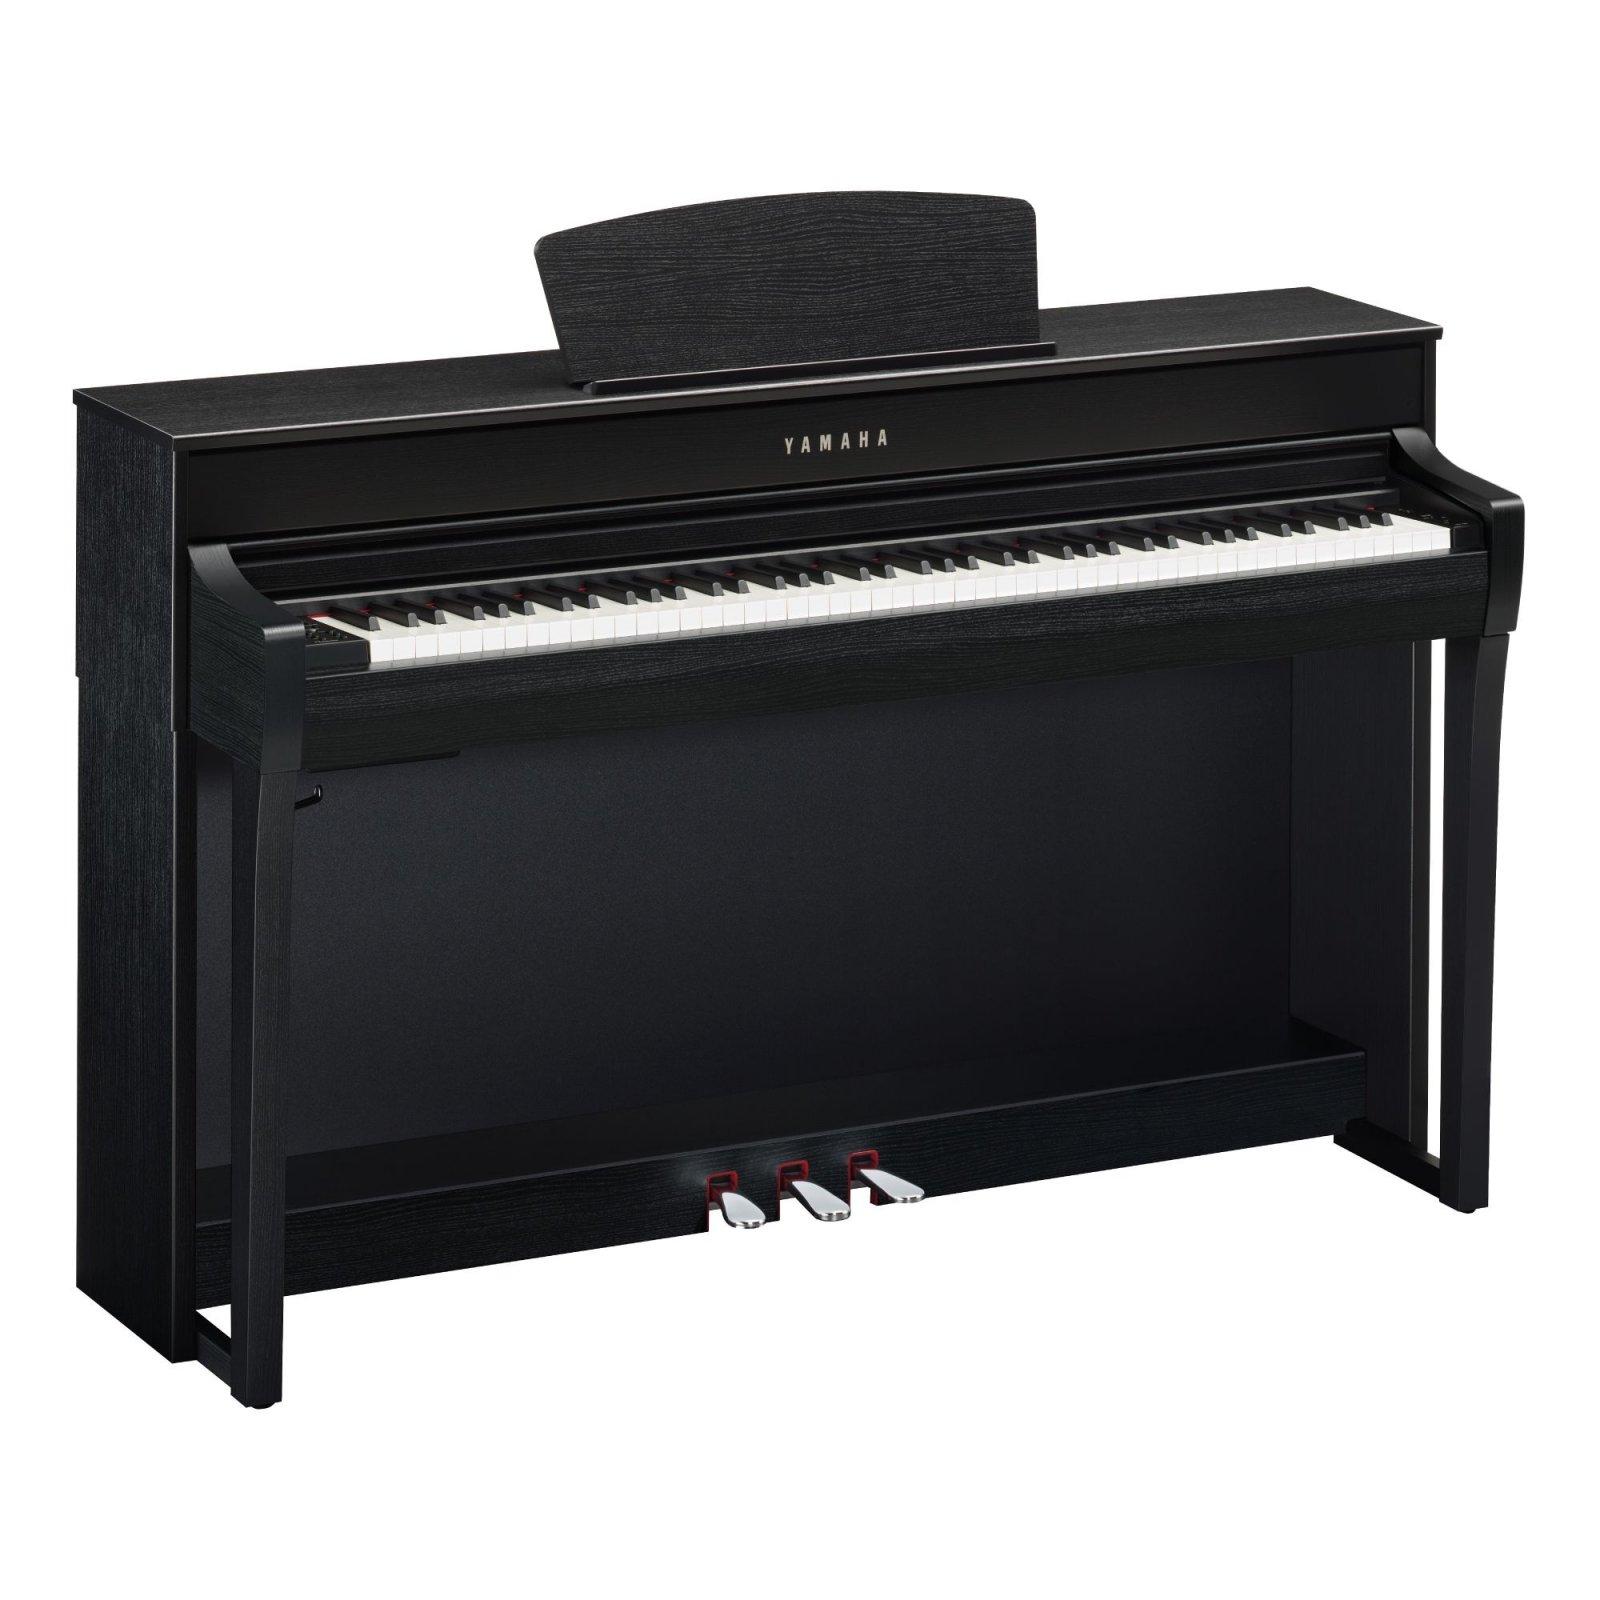 Yamaha CLP-735B Clavinova console digital piano - Matte black - with bench